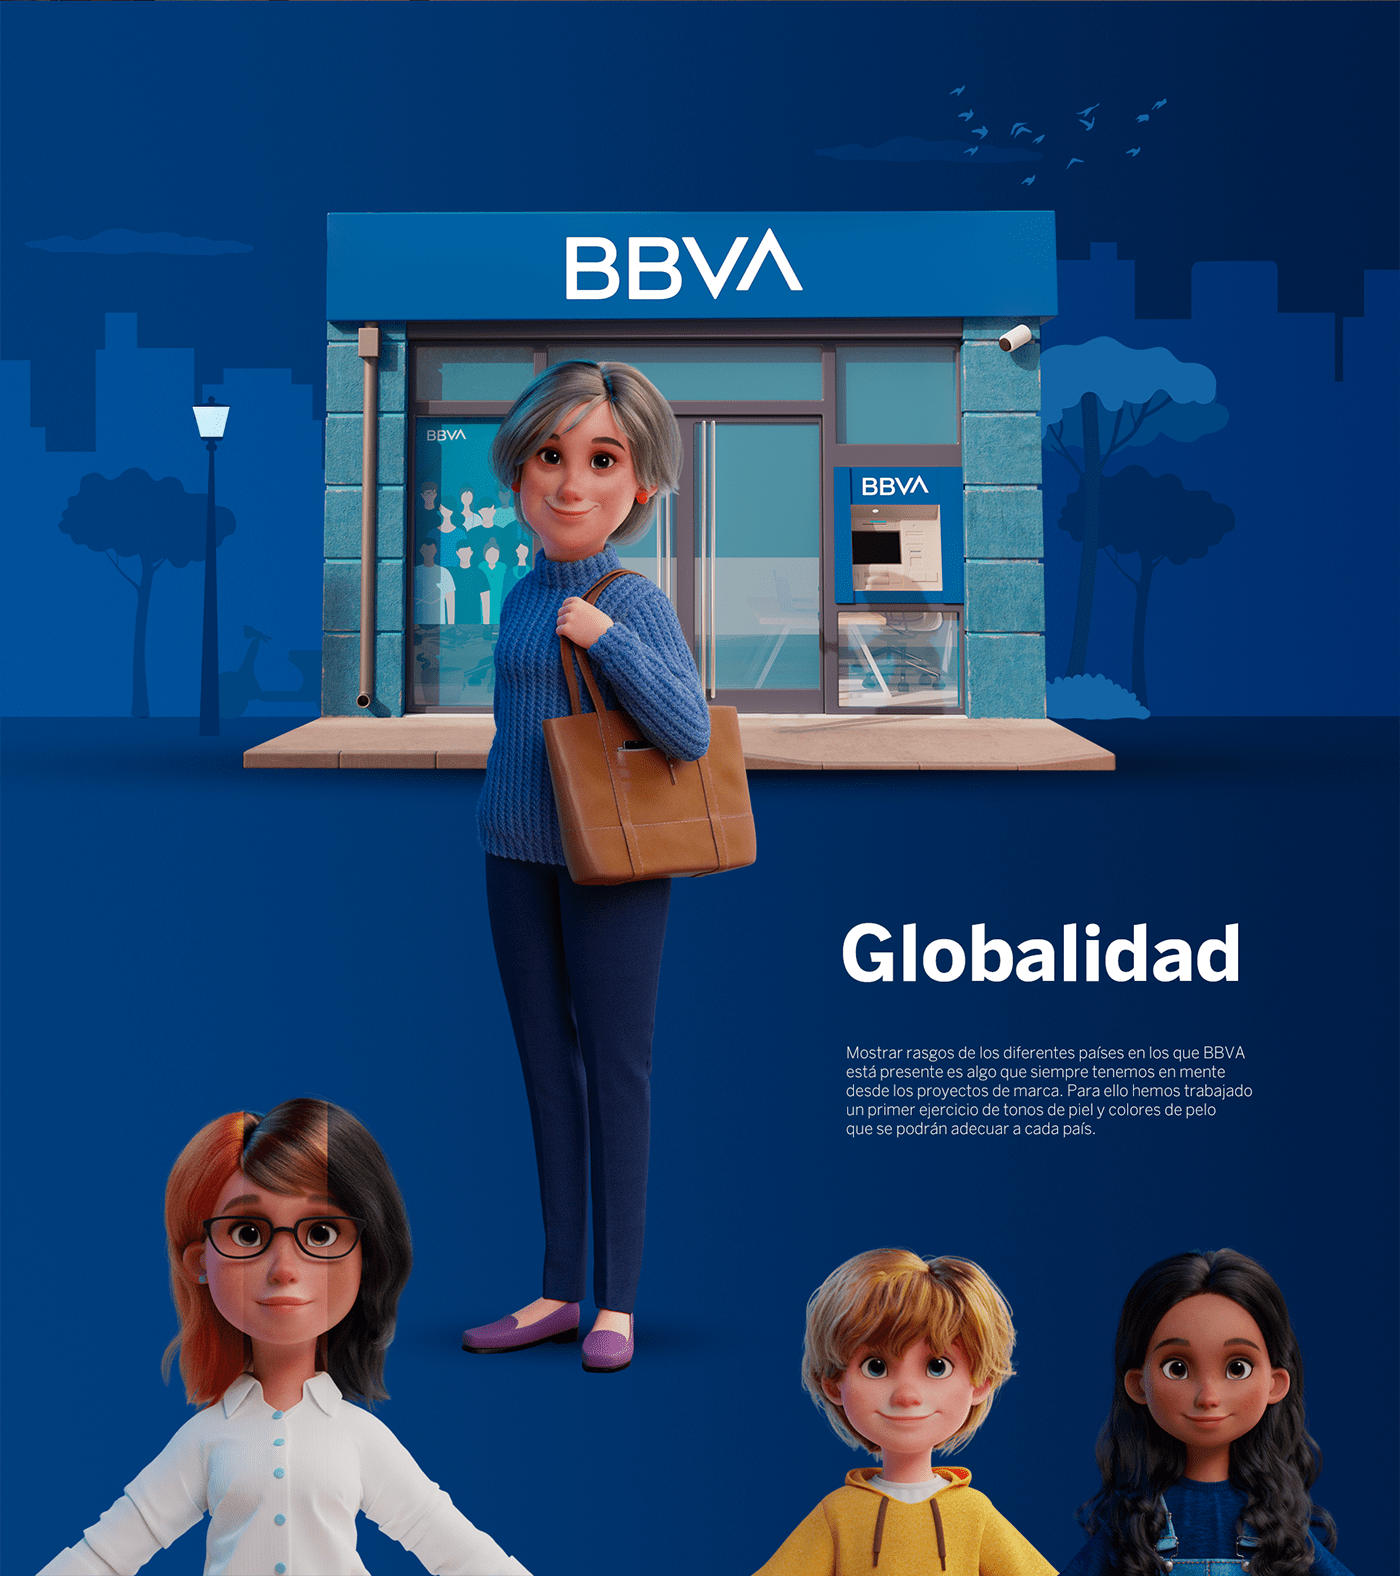 3D Bank bbva characters banking branding  ILLUSTRATION  marketing